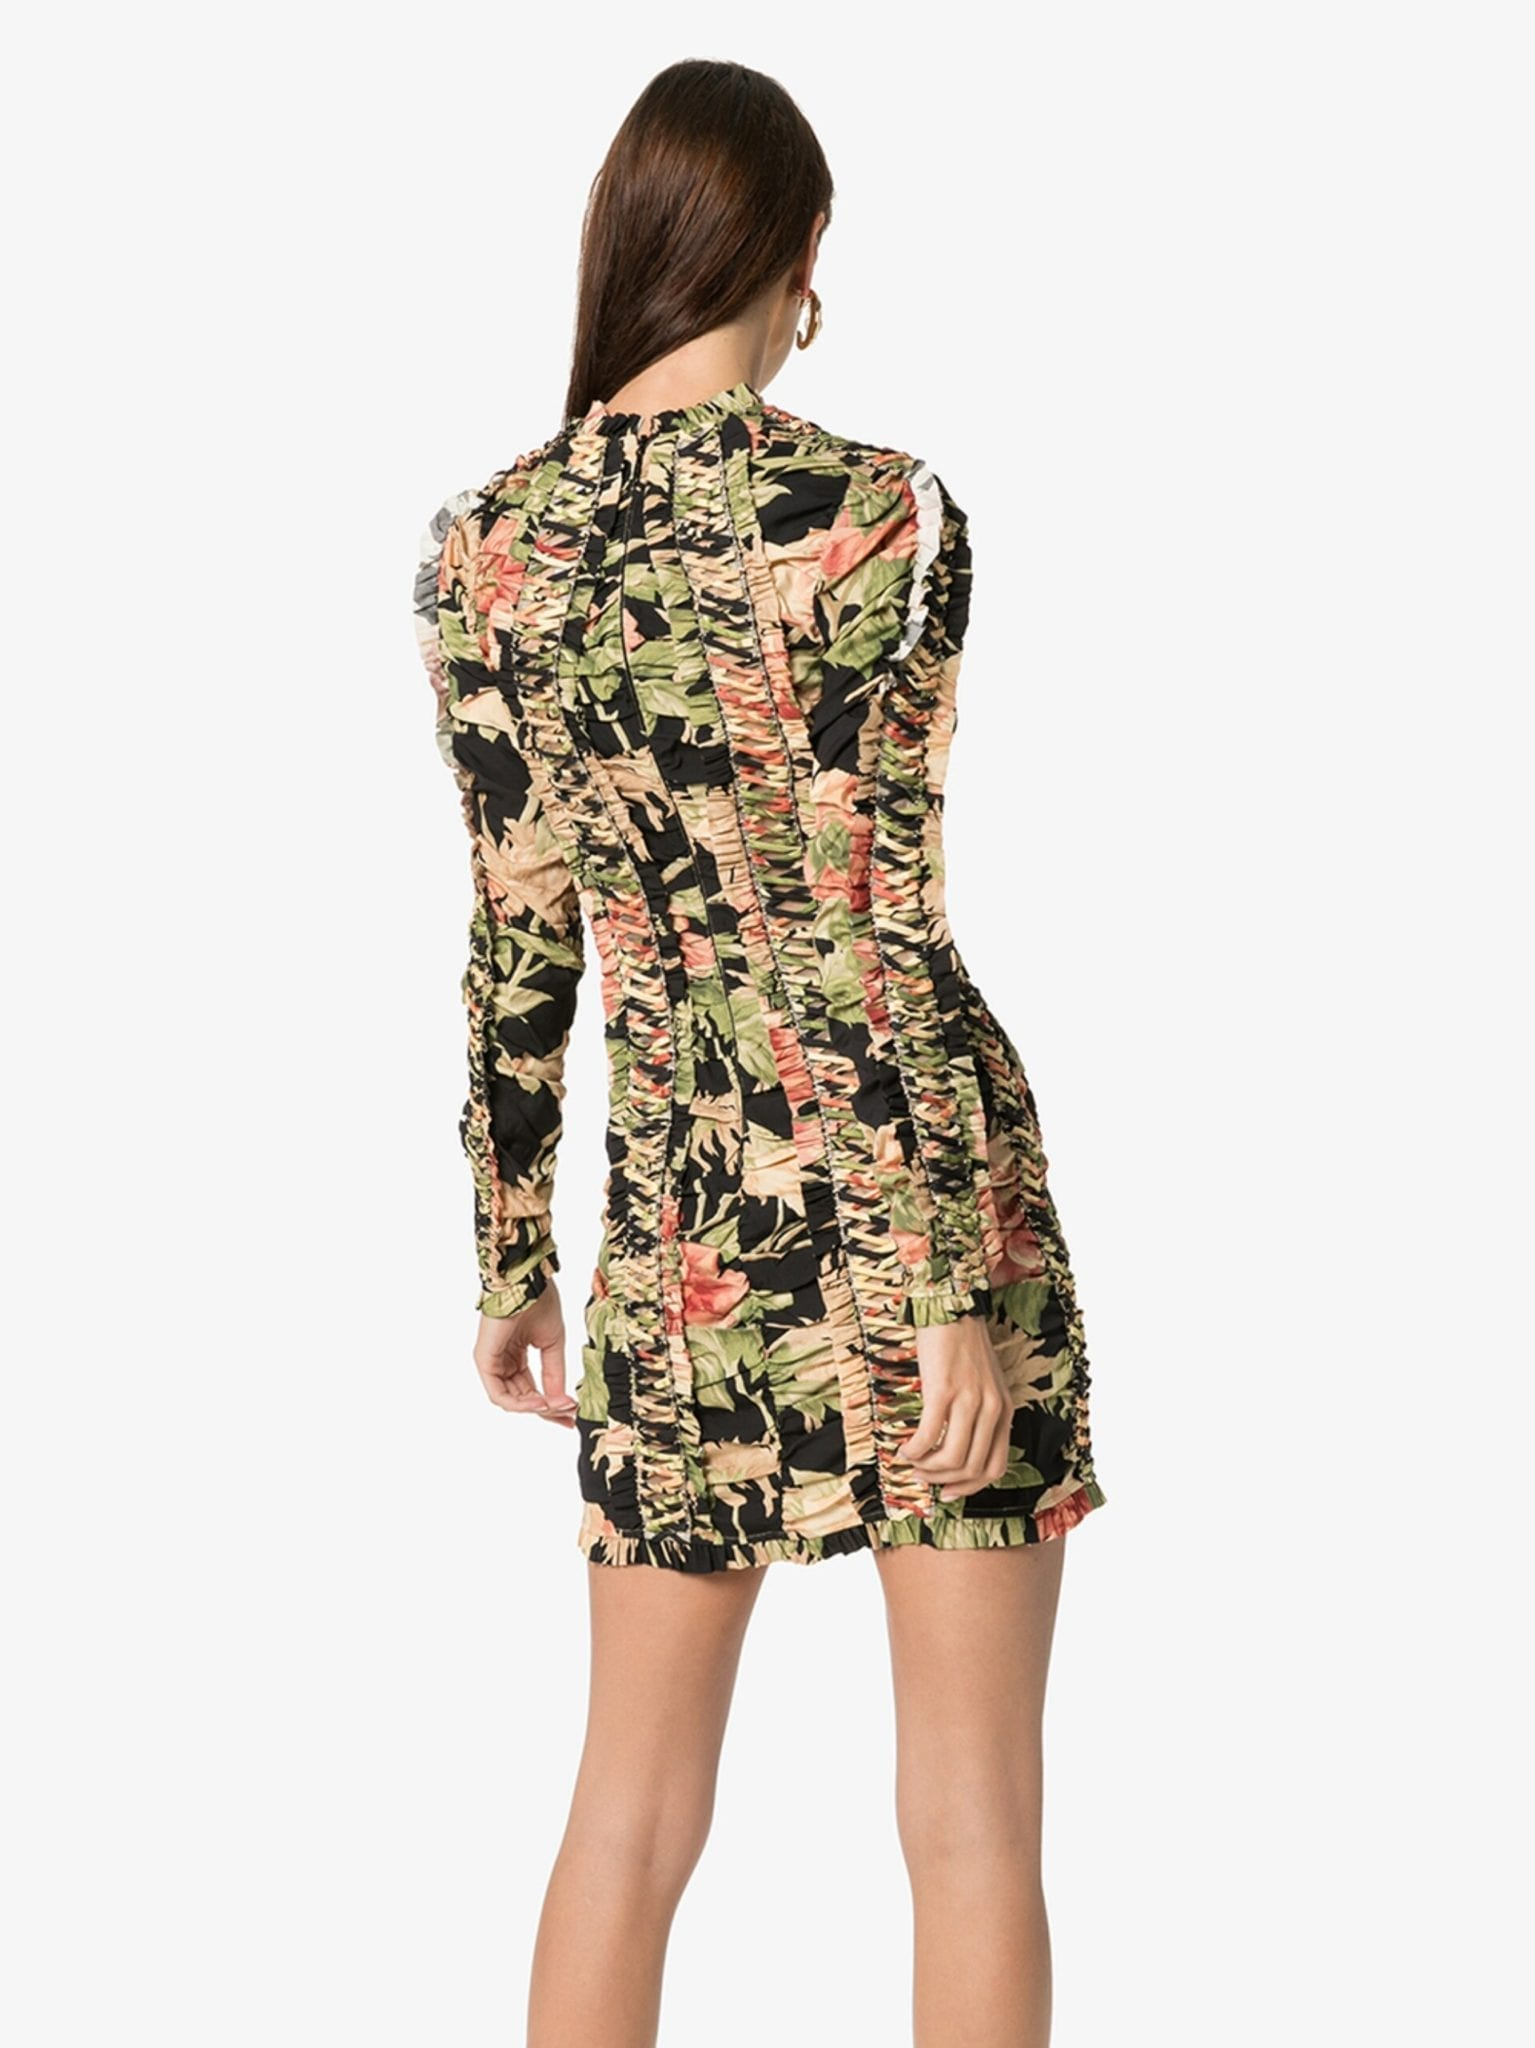 ZIMMERMANN Floral Lace-Up Silk Dress